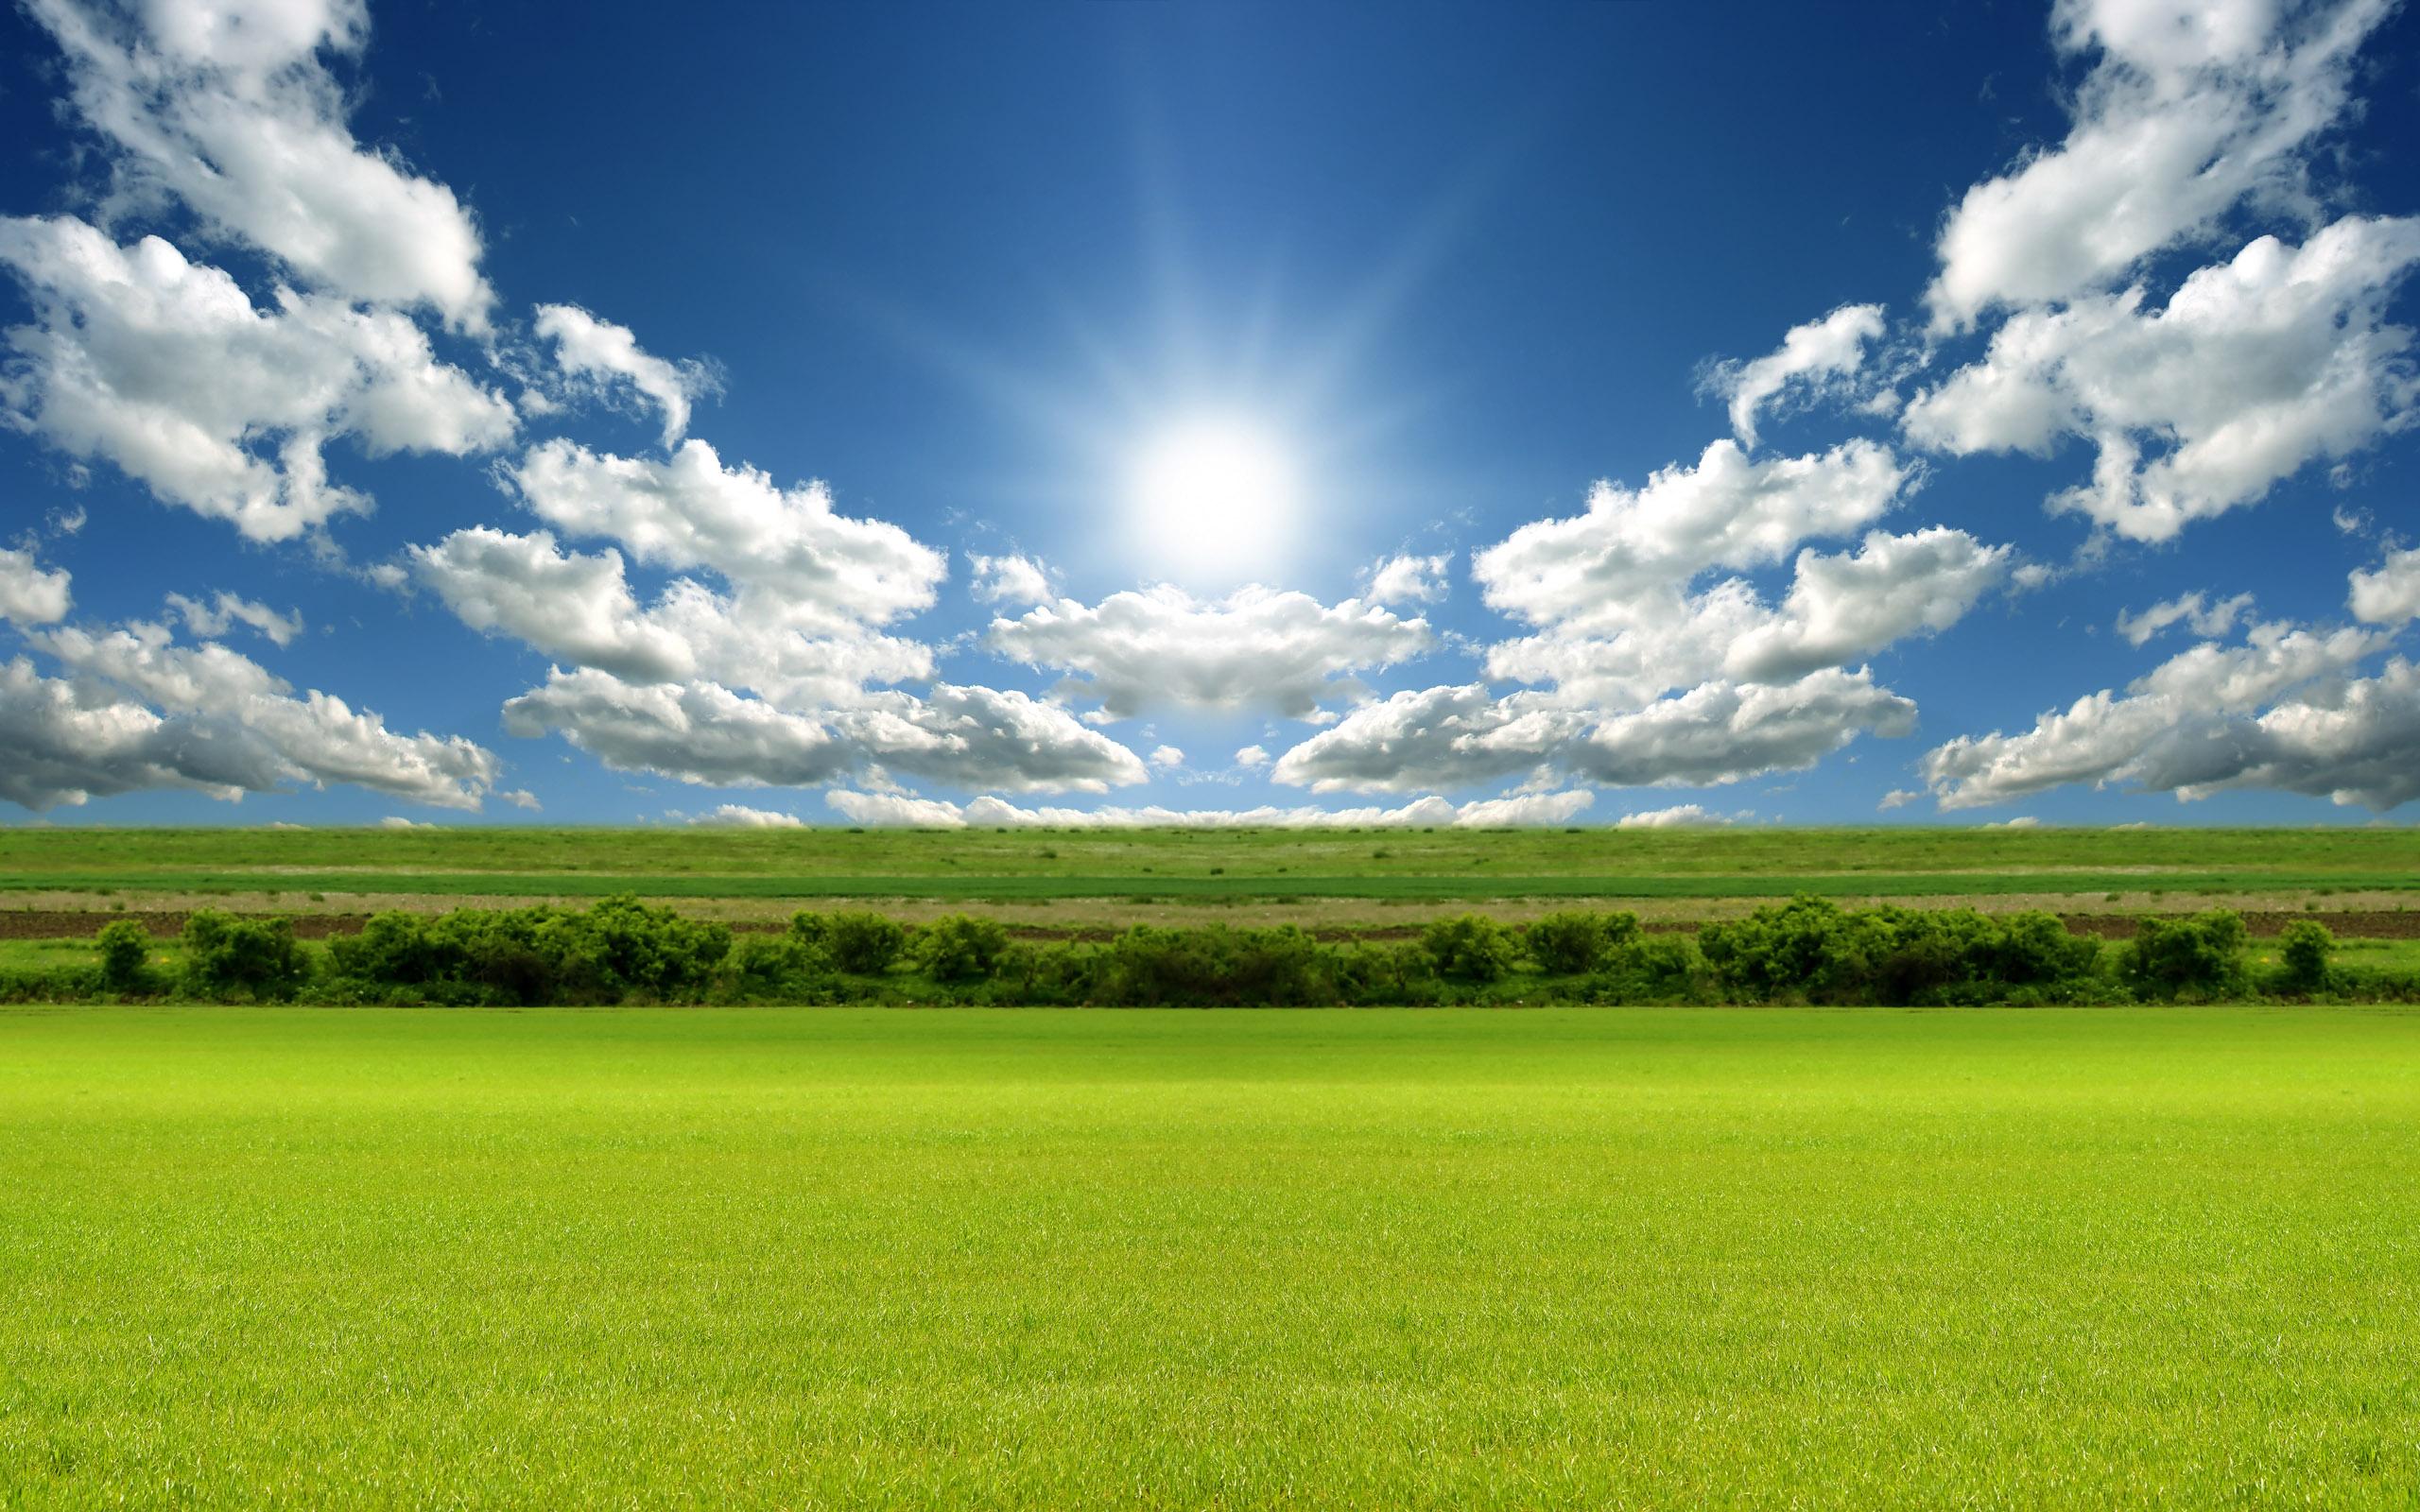 Landscape Hd Wallpaper Background Image 2560x1600 Id103150